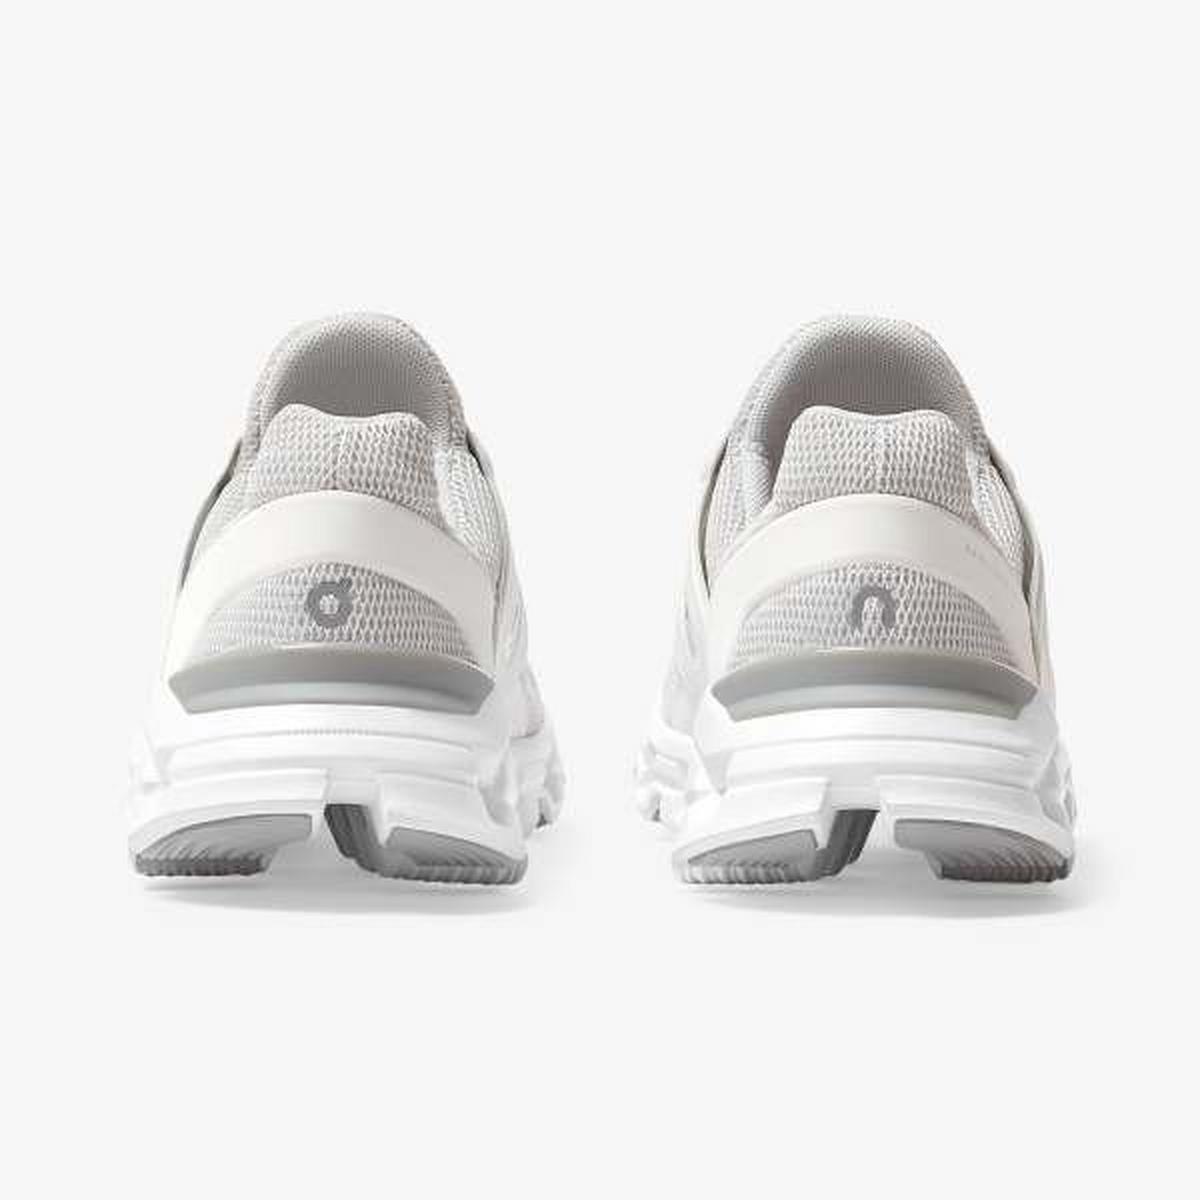 On Women's Cloudswift Running Shoe - Glacier White